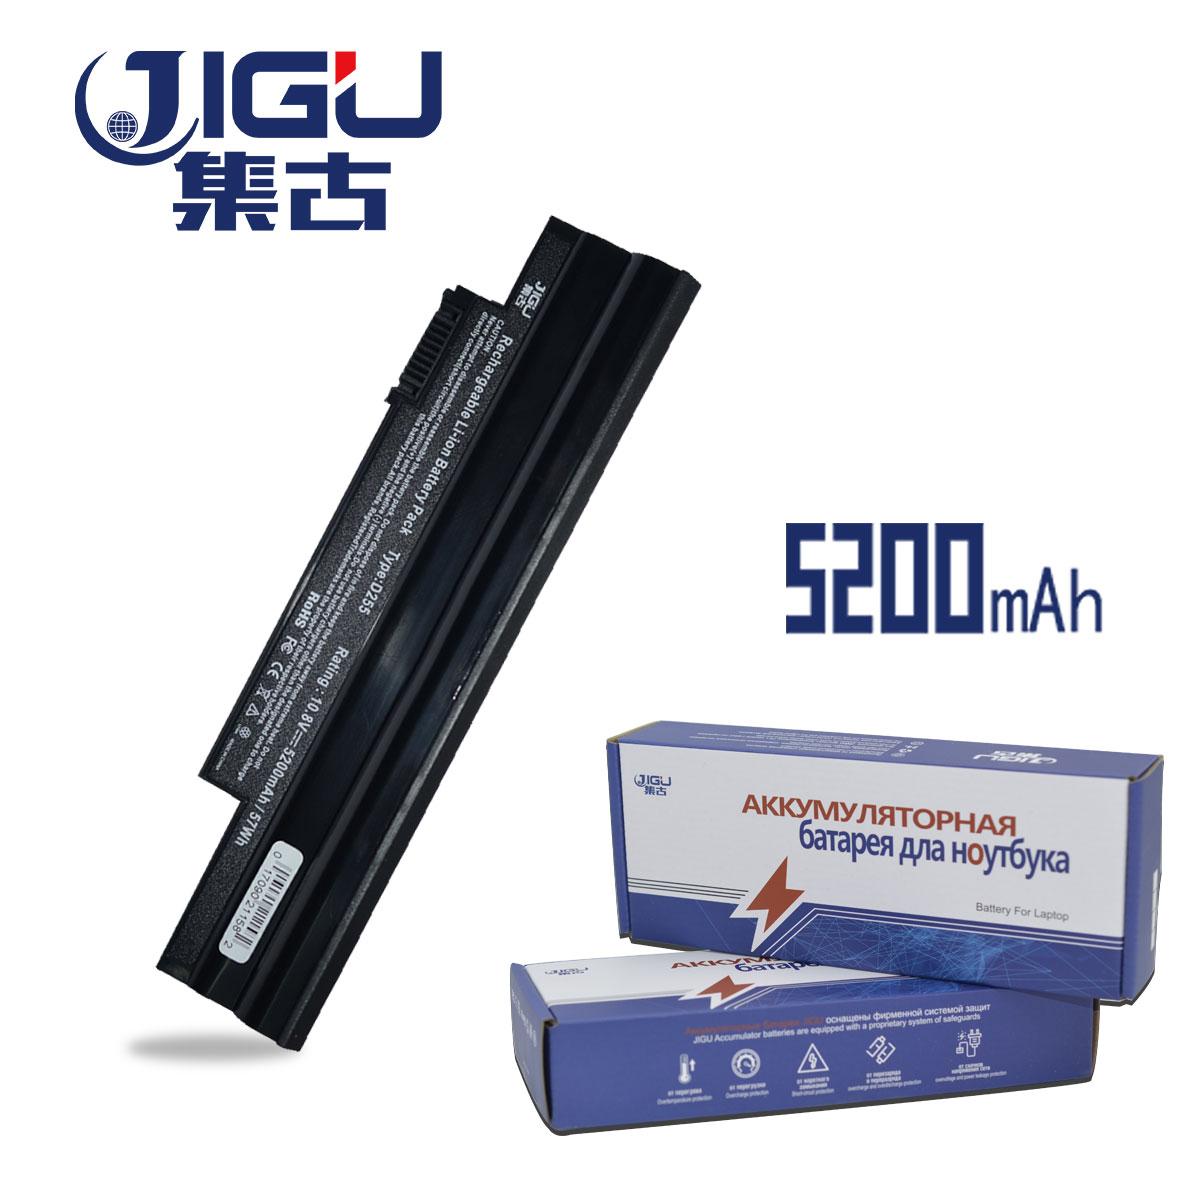 JIGU Battery For Acer Aspire One 522 D255 722 AOD255 AOD260 D255E D257 D257E D260 D270 E100 AL10A31 AL10B31 AL10G31